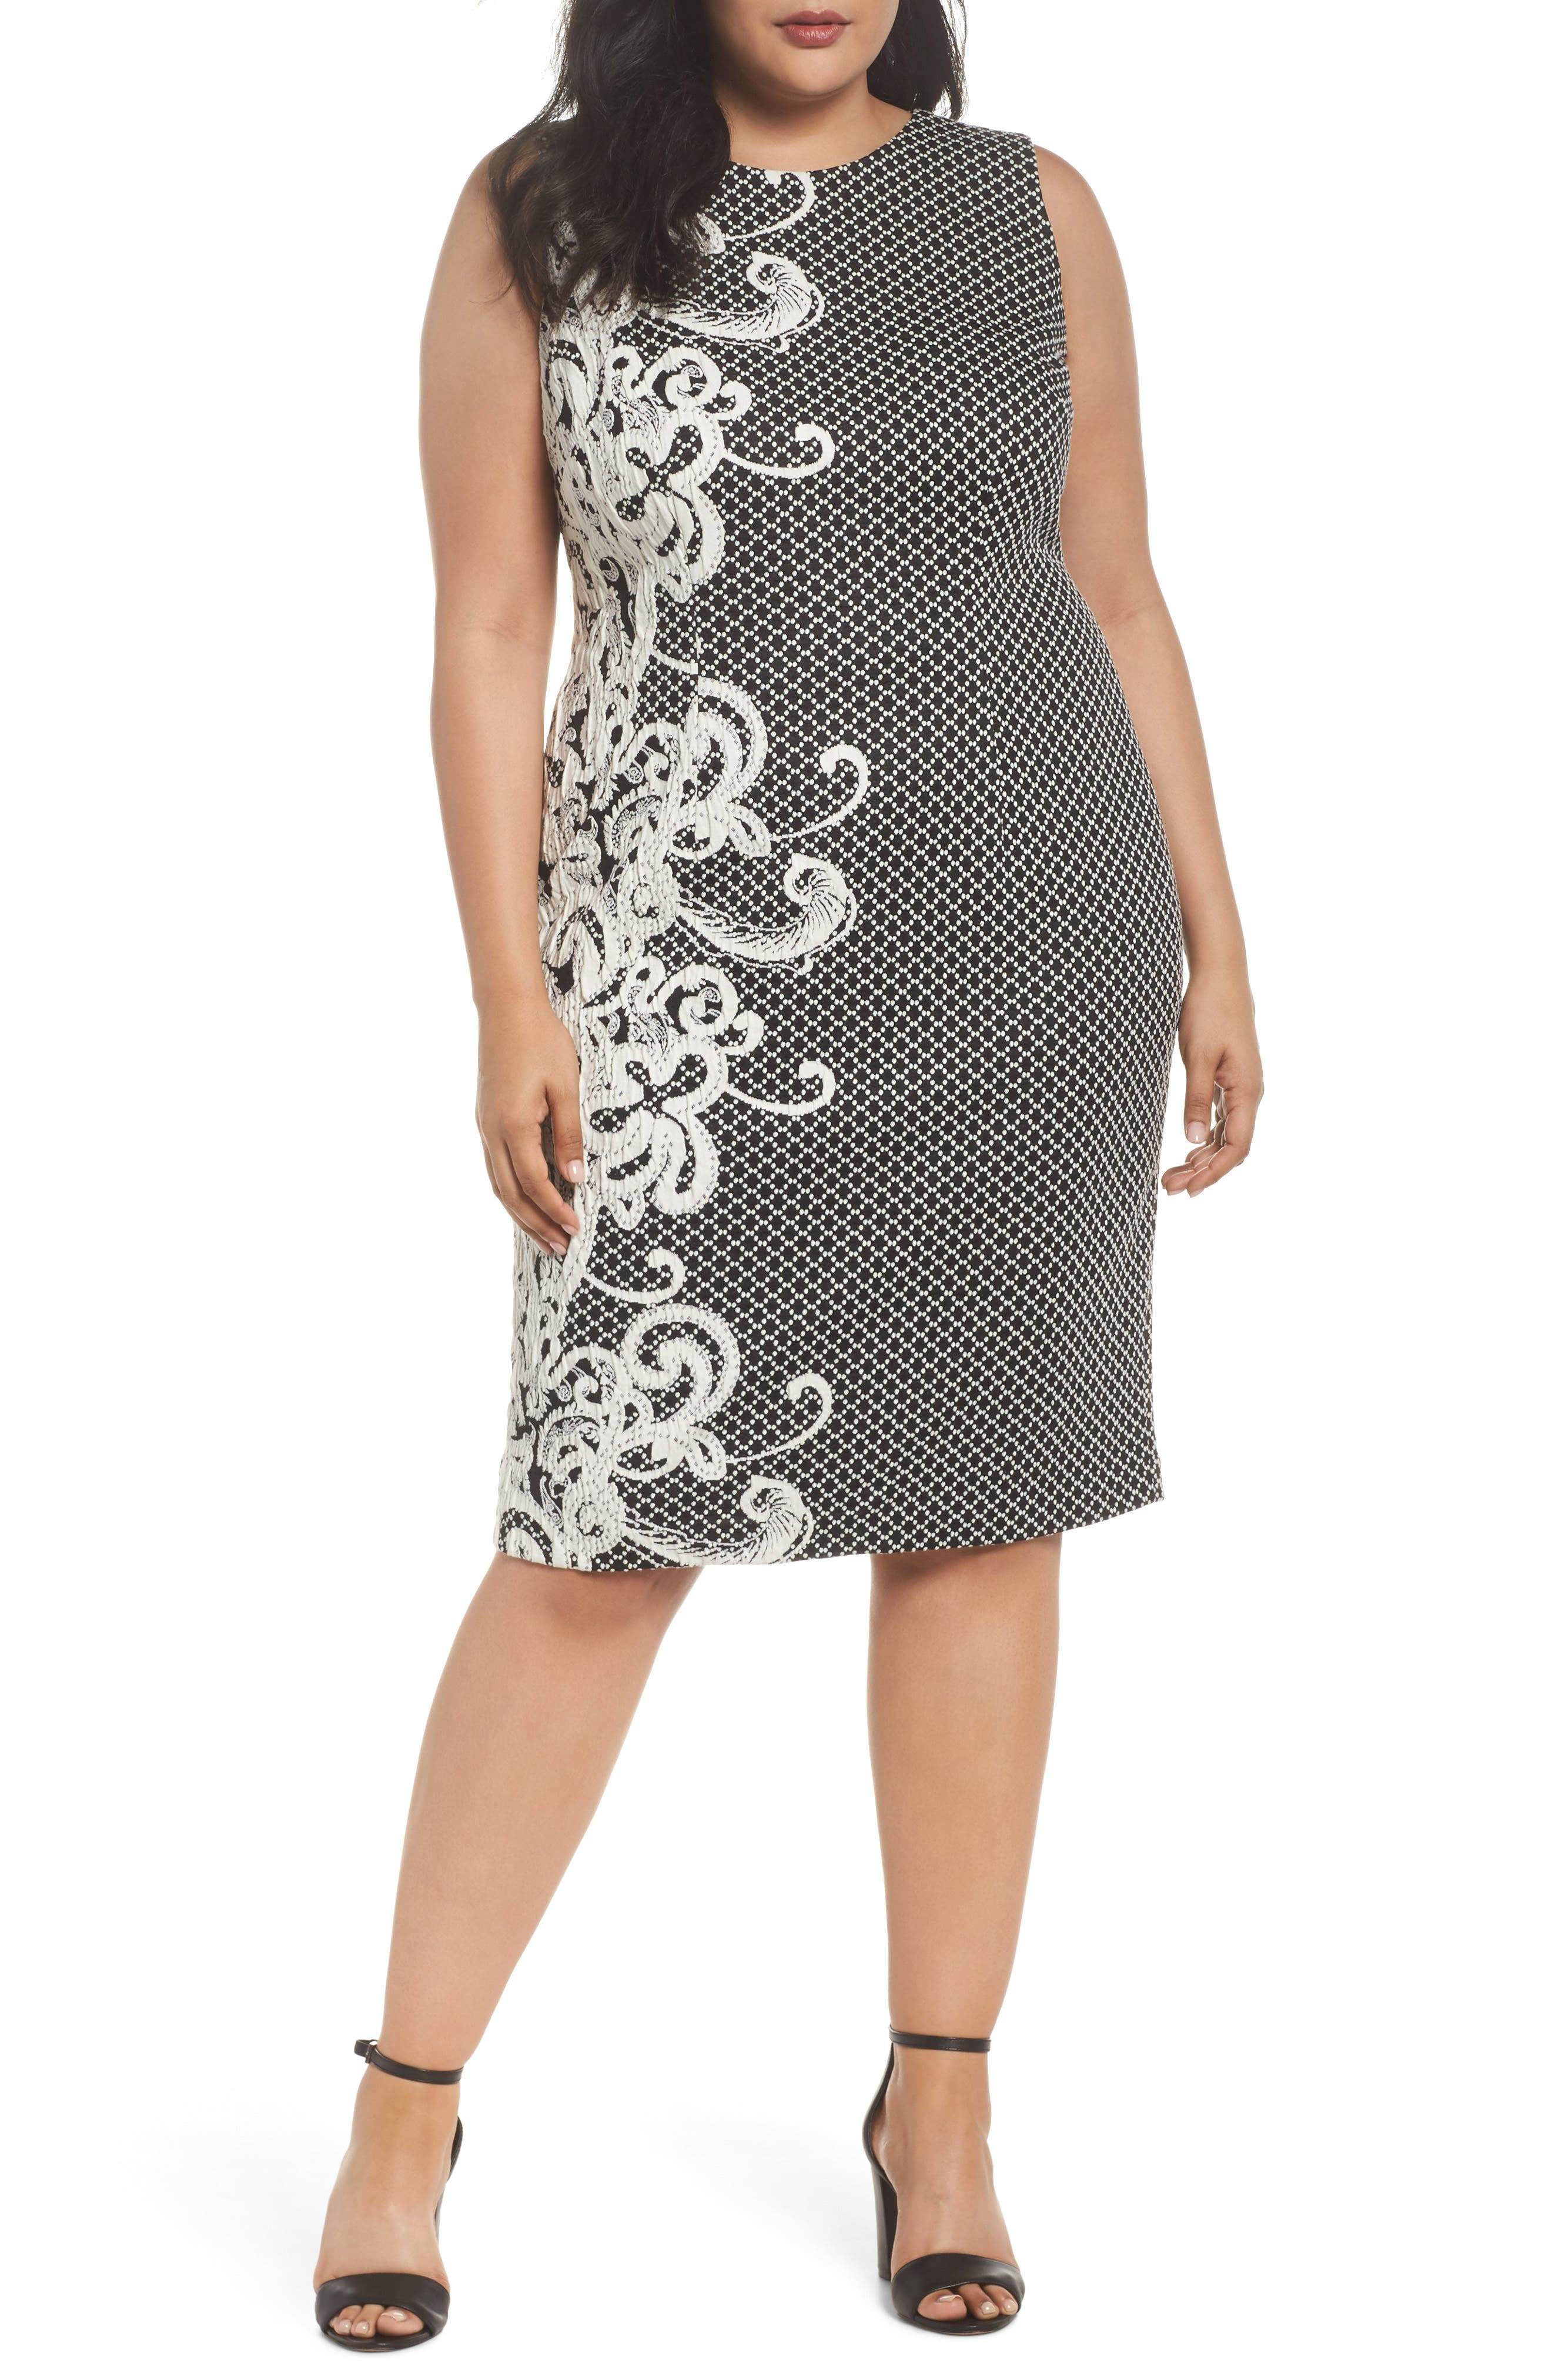 Scroll Border Knit Sheath Dress,                             Main thumbnail 1, color,                             Black/ Ivory